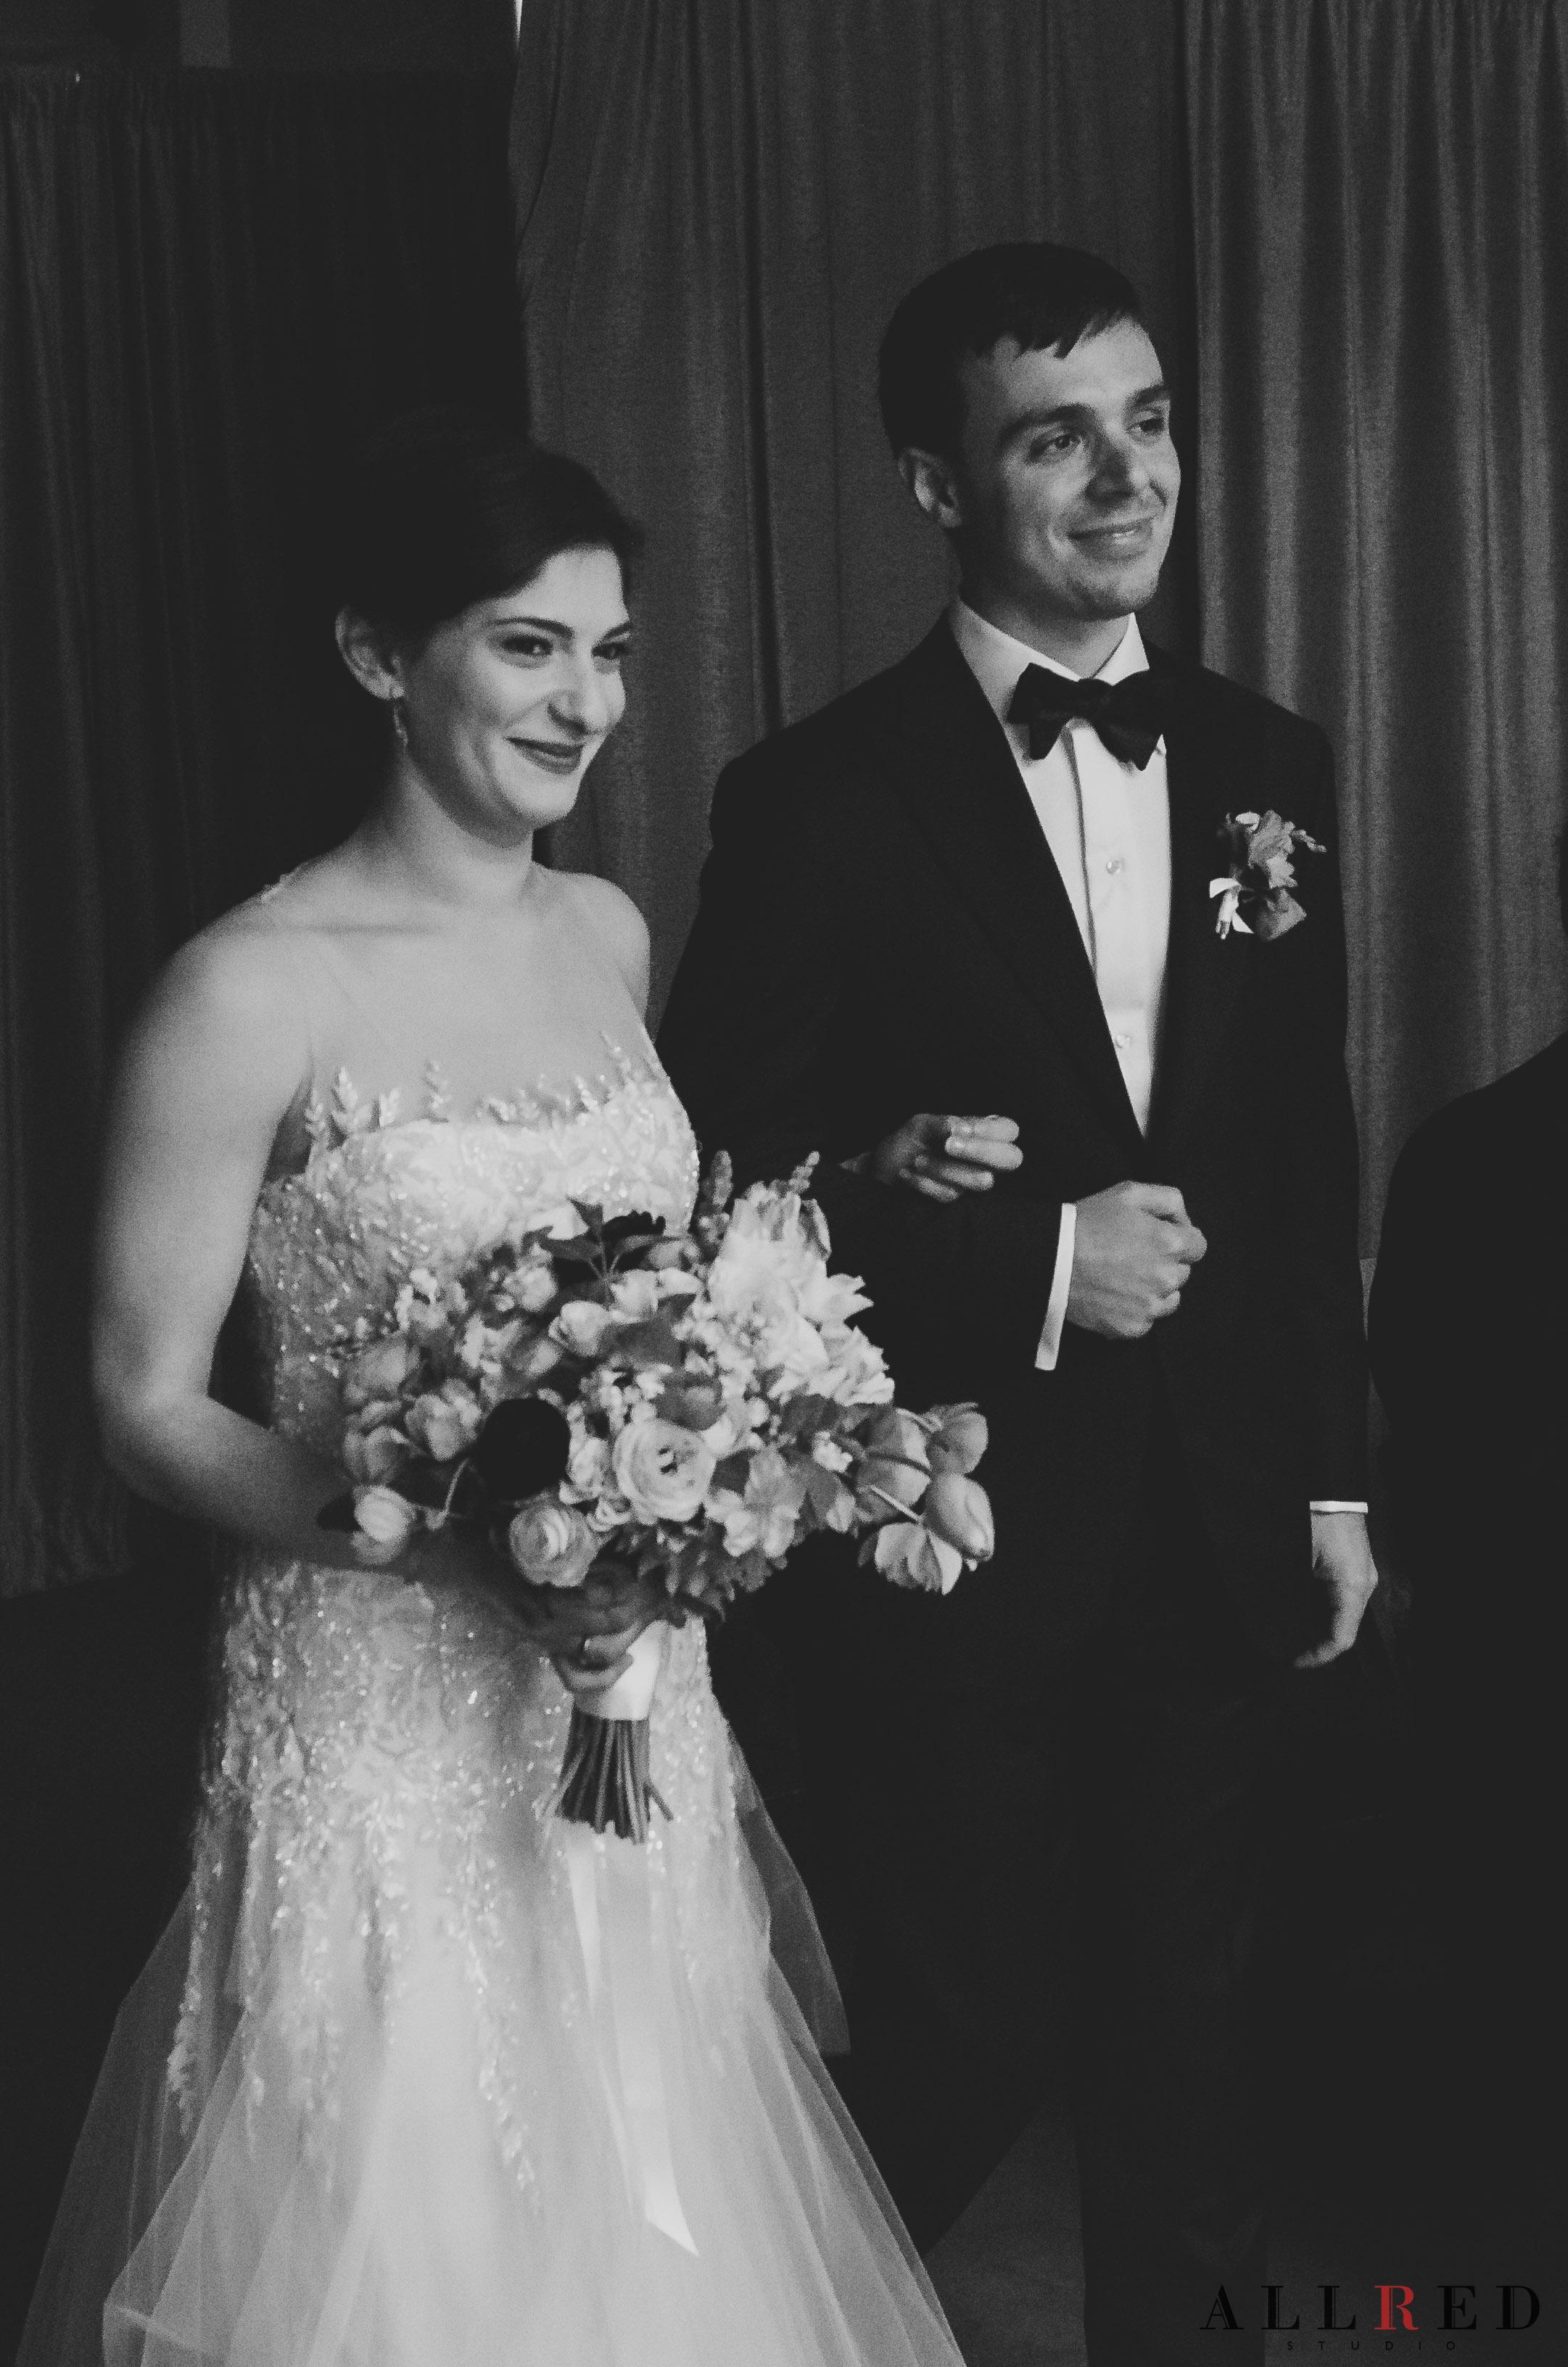 Wedding-Brooklyn-winery-allred-studio-new-york-photographer-new-jersey-hudson-valley-3278.jpg